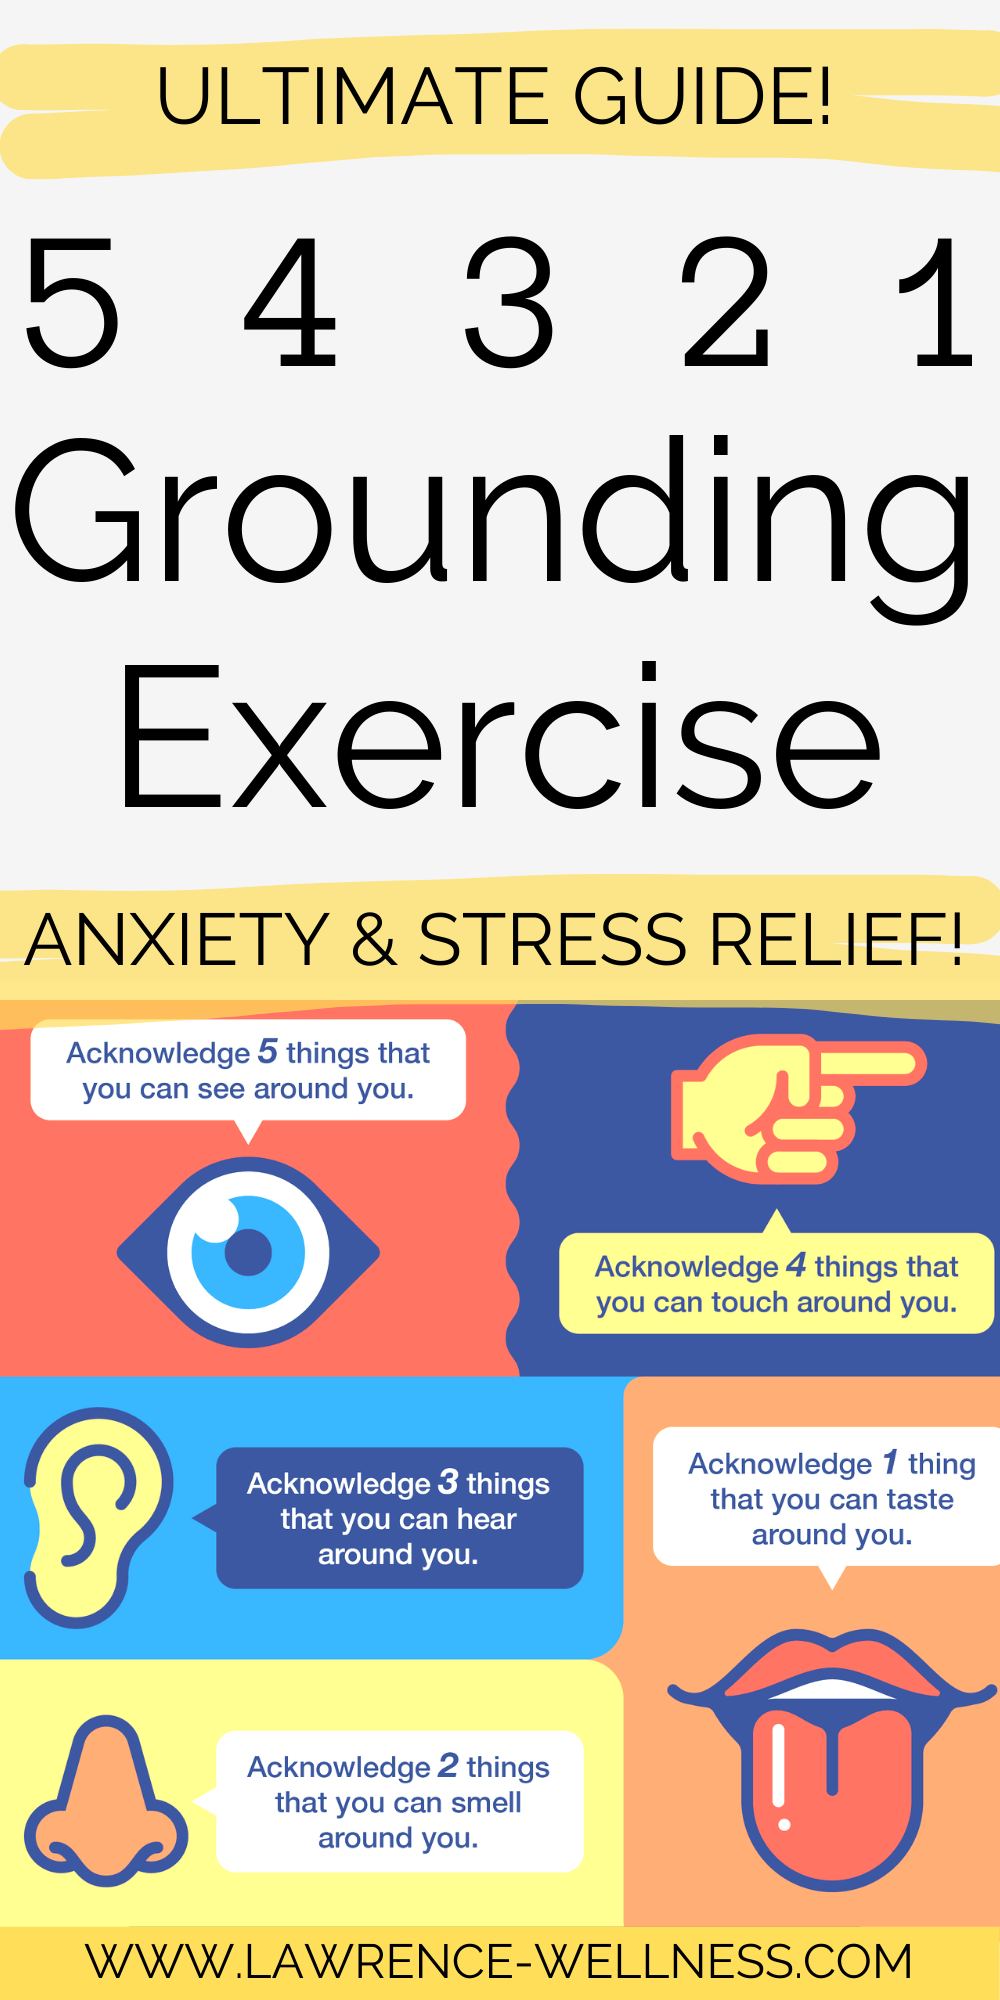 54321-grounding-exercise